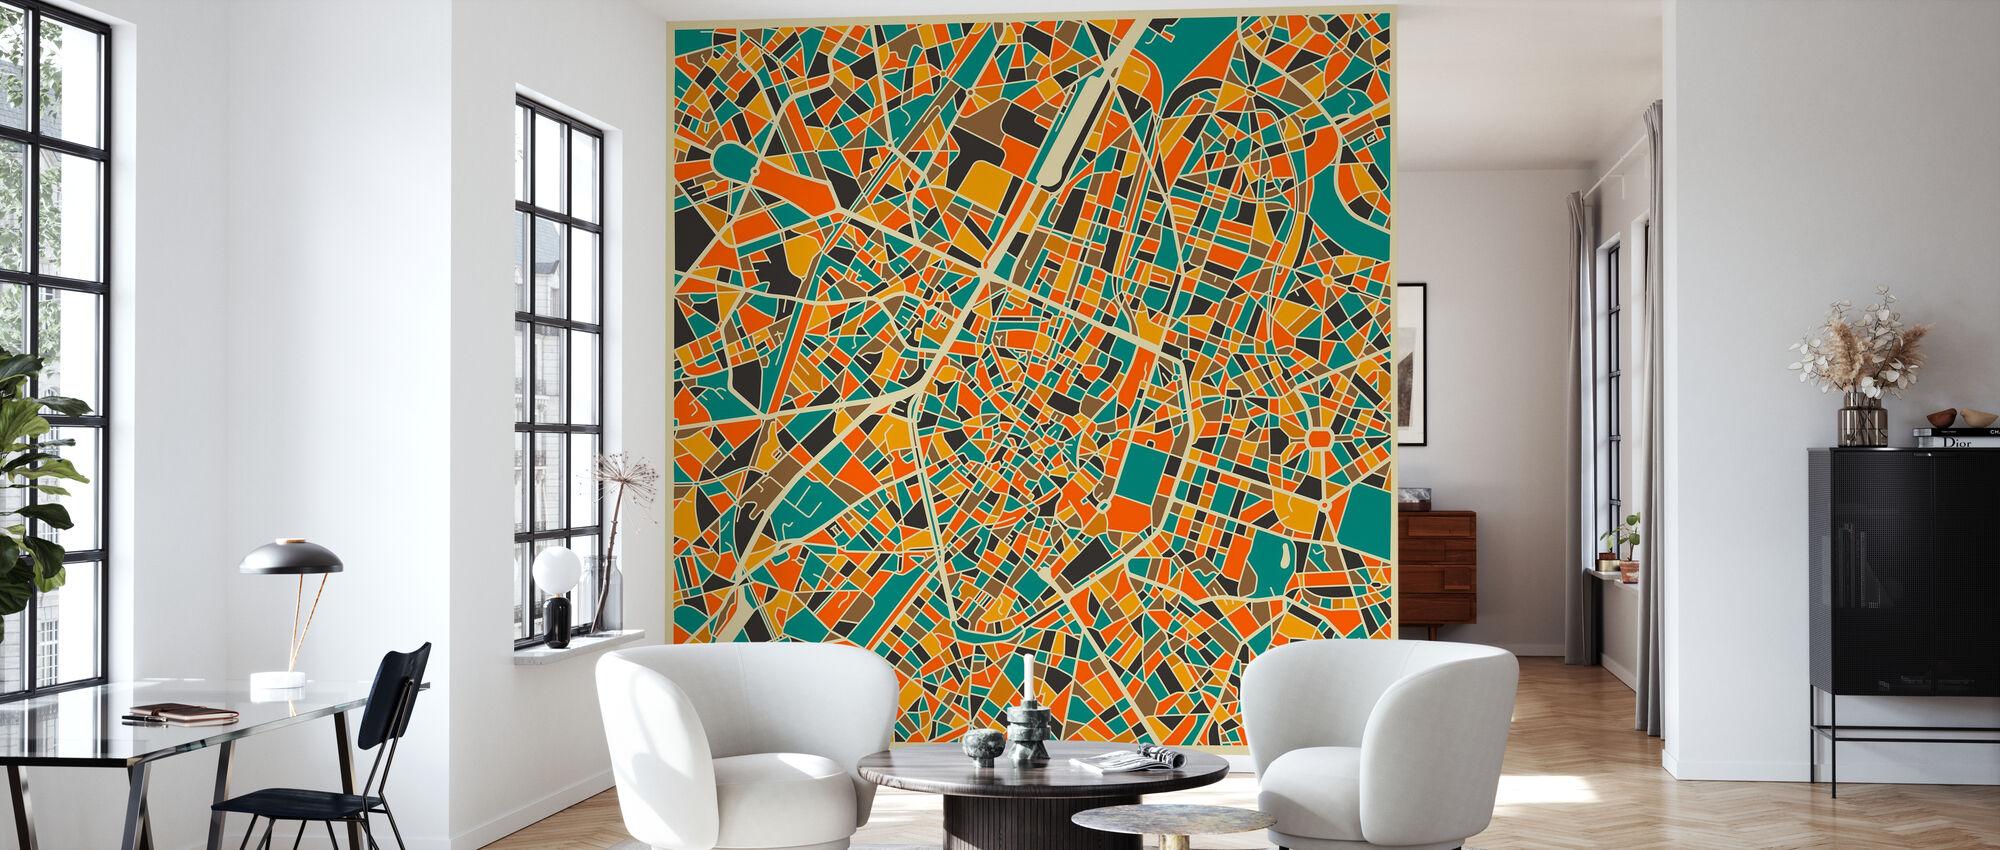 Multicolor Map - Brussels - Wallpaper - Living Room